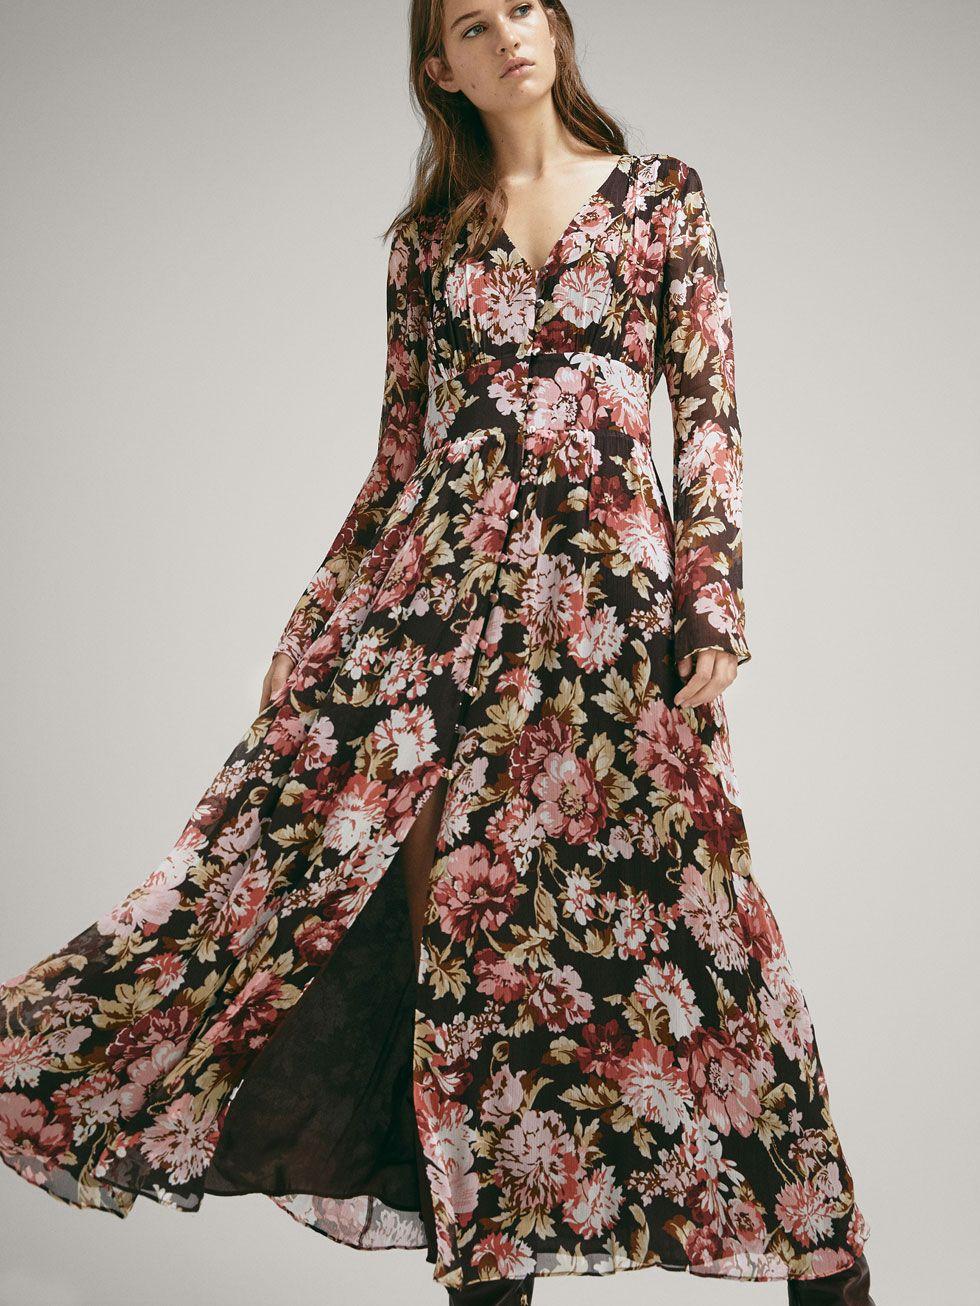 c571e51ab FLORAL PRINT CREPE DRESS - Women - Massimo Dutti | Attire | Dresses ...